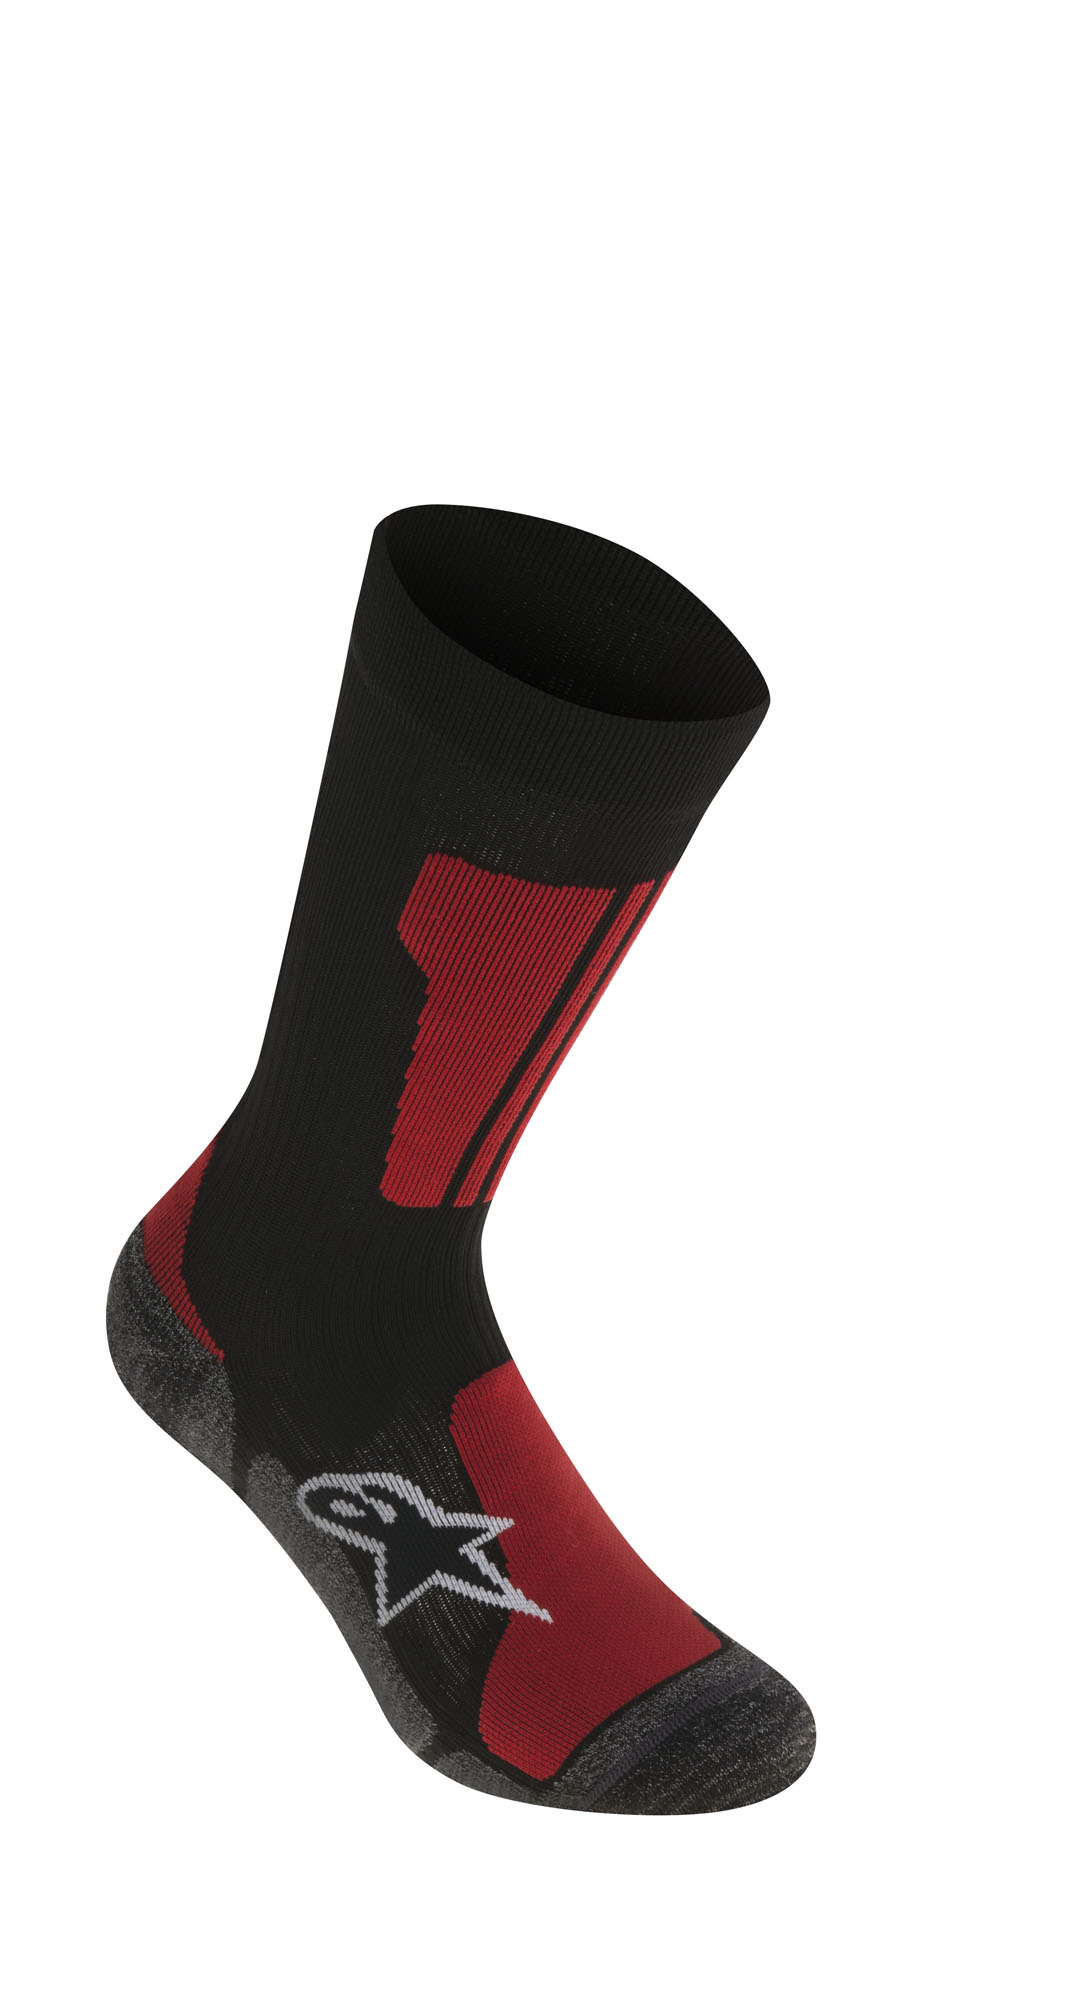 1701516 Alpinestars Mens Thermal Socks MTB Mountain Biking Cycling Adults Cotton